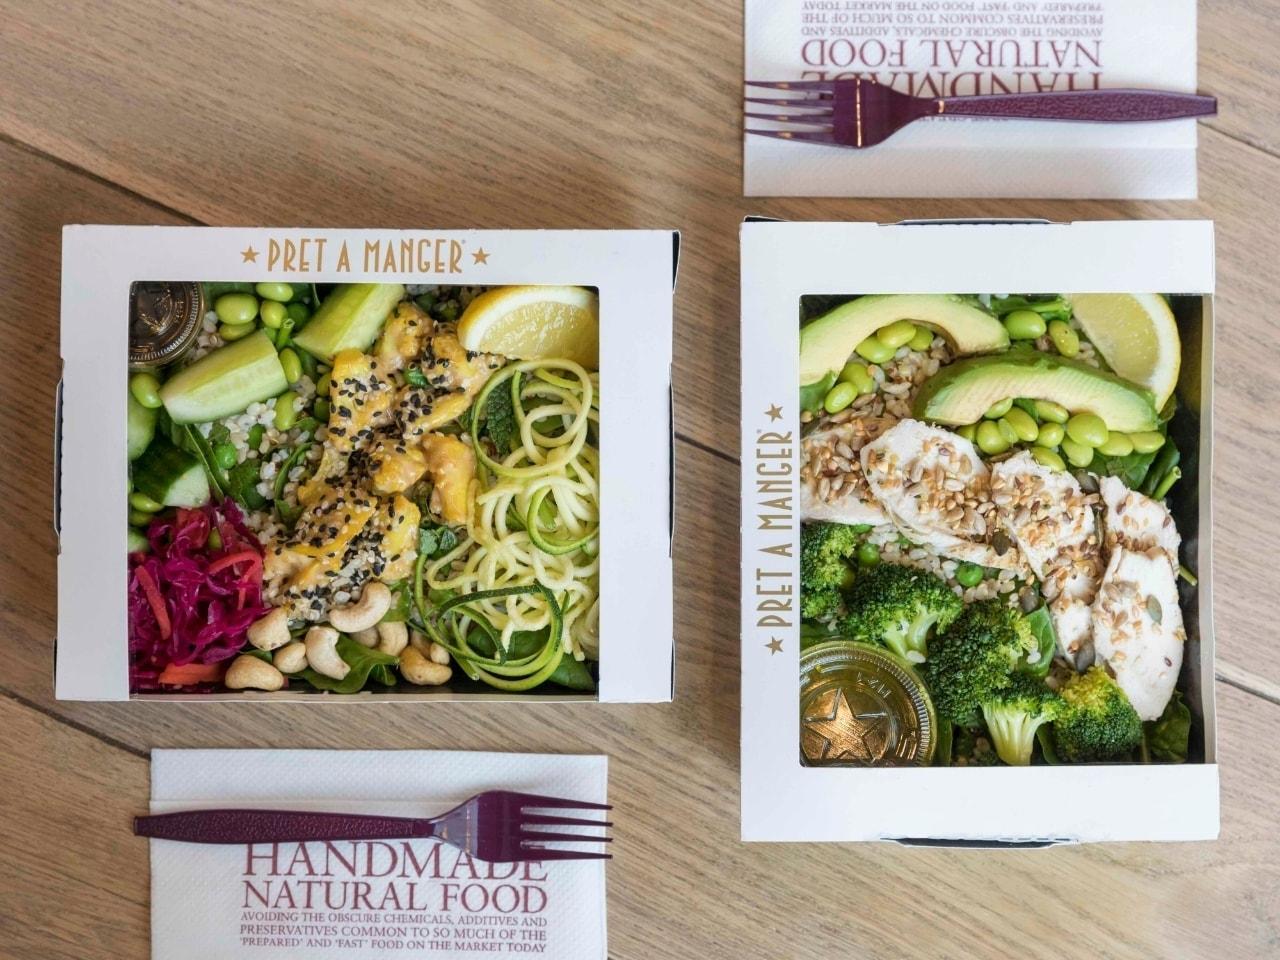 1 x Pret A Manger Tuna Nicoise Salad